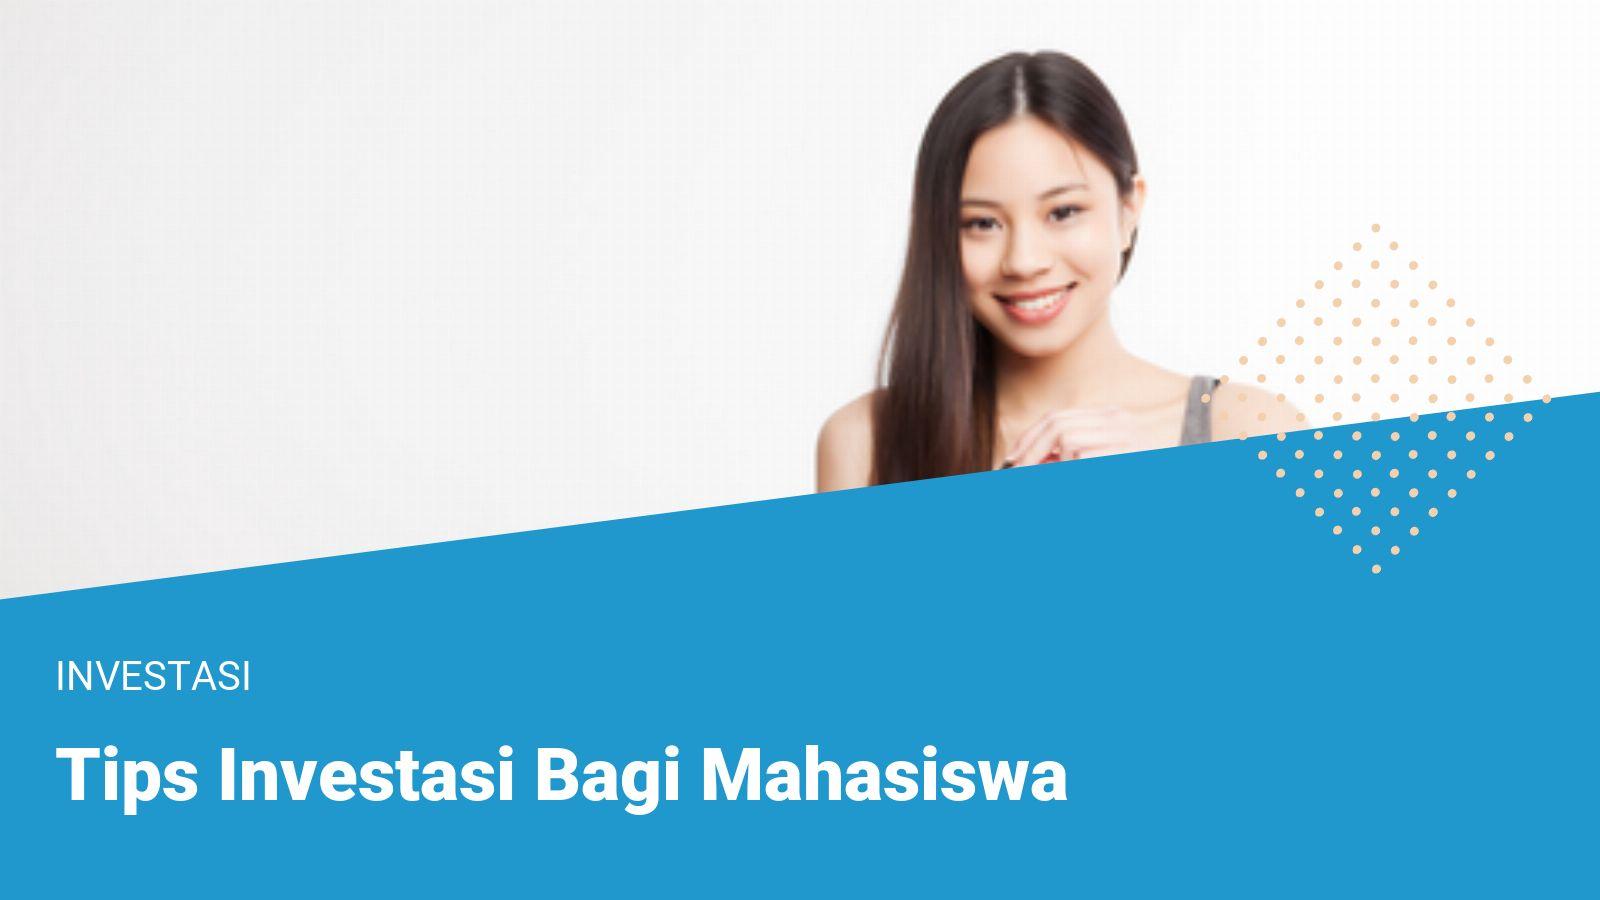 Tips Investasi Bagi Mahasiswa